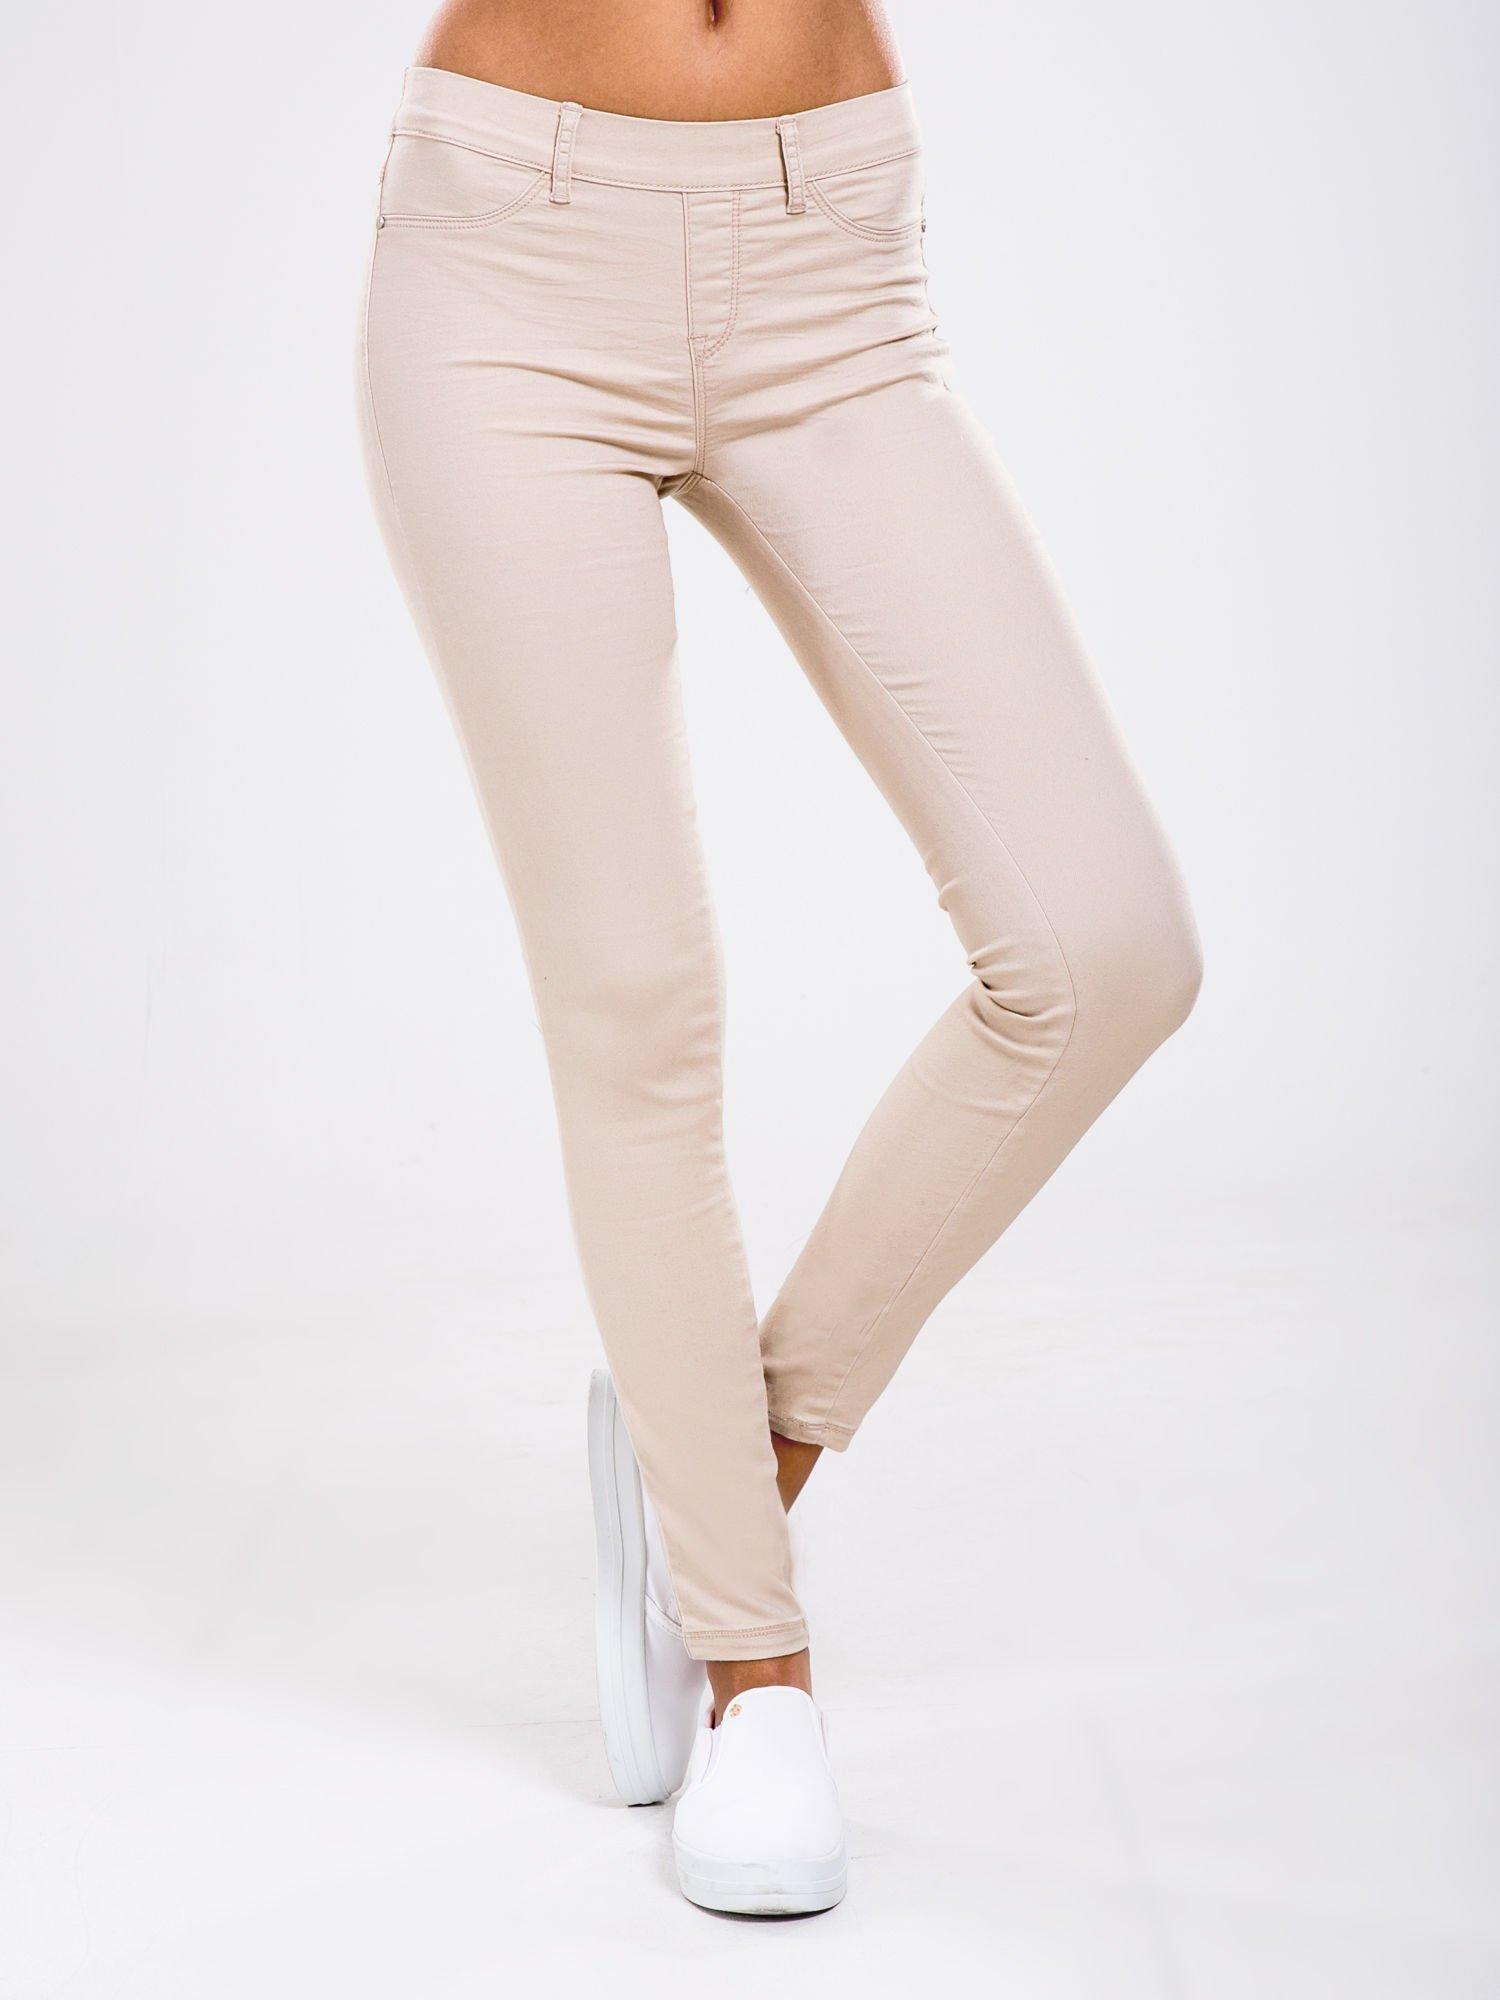 STRADIVARIUS Beżowe spodnie skinny typu jegginsy                                  zdj.                                  1